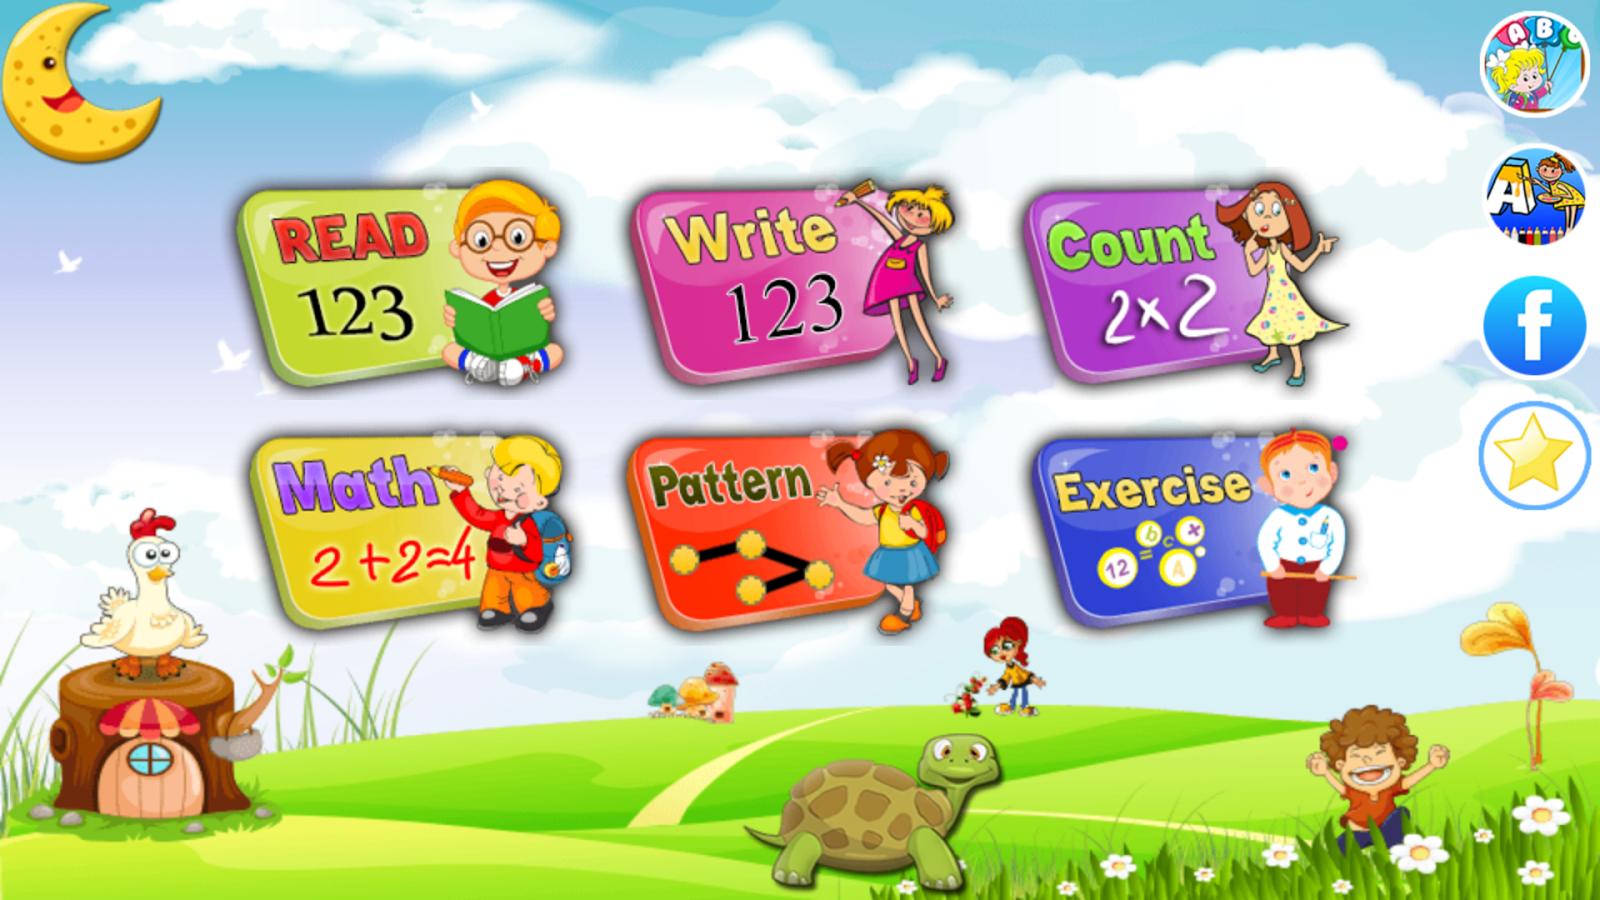 preschool math games fun pro screenshot - Pictures For Preschool